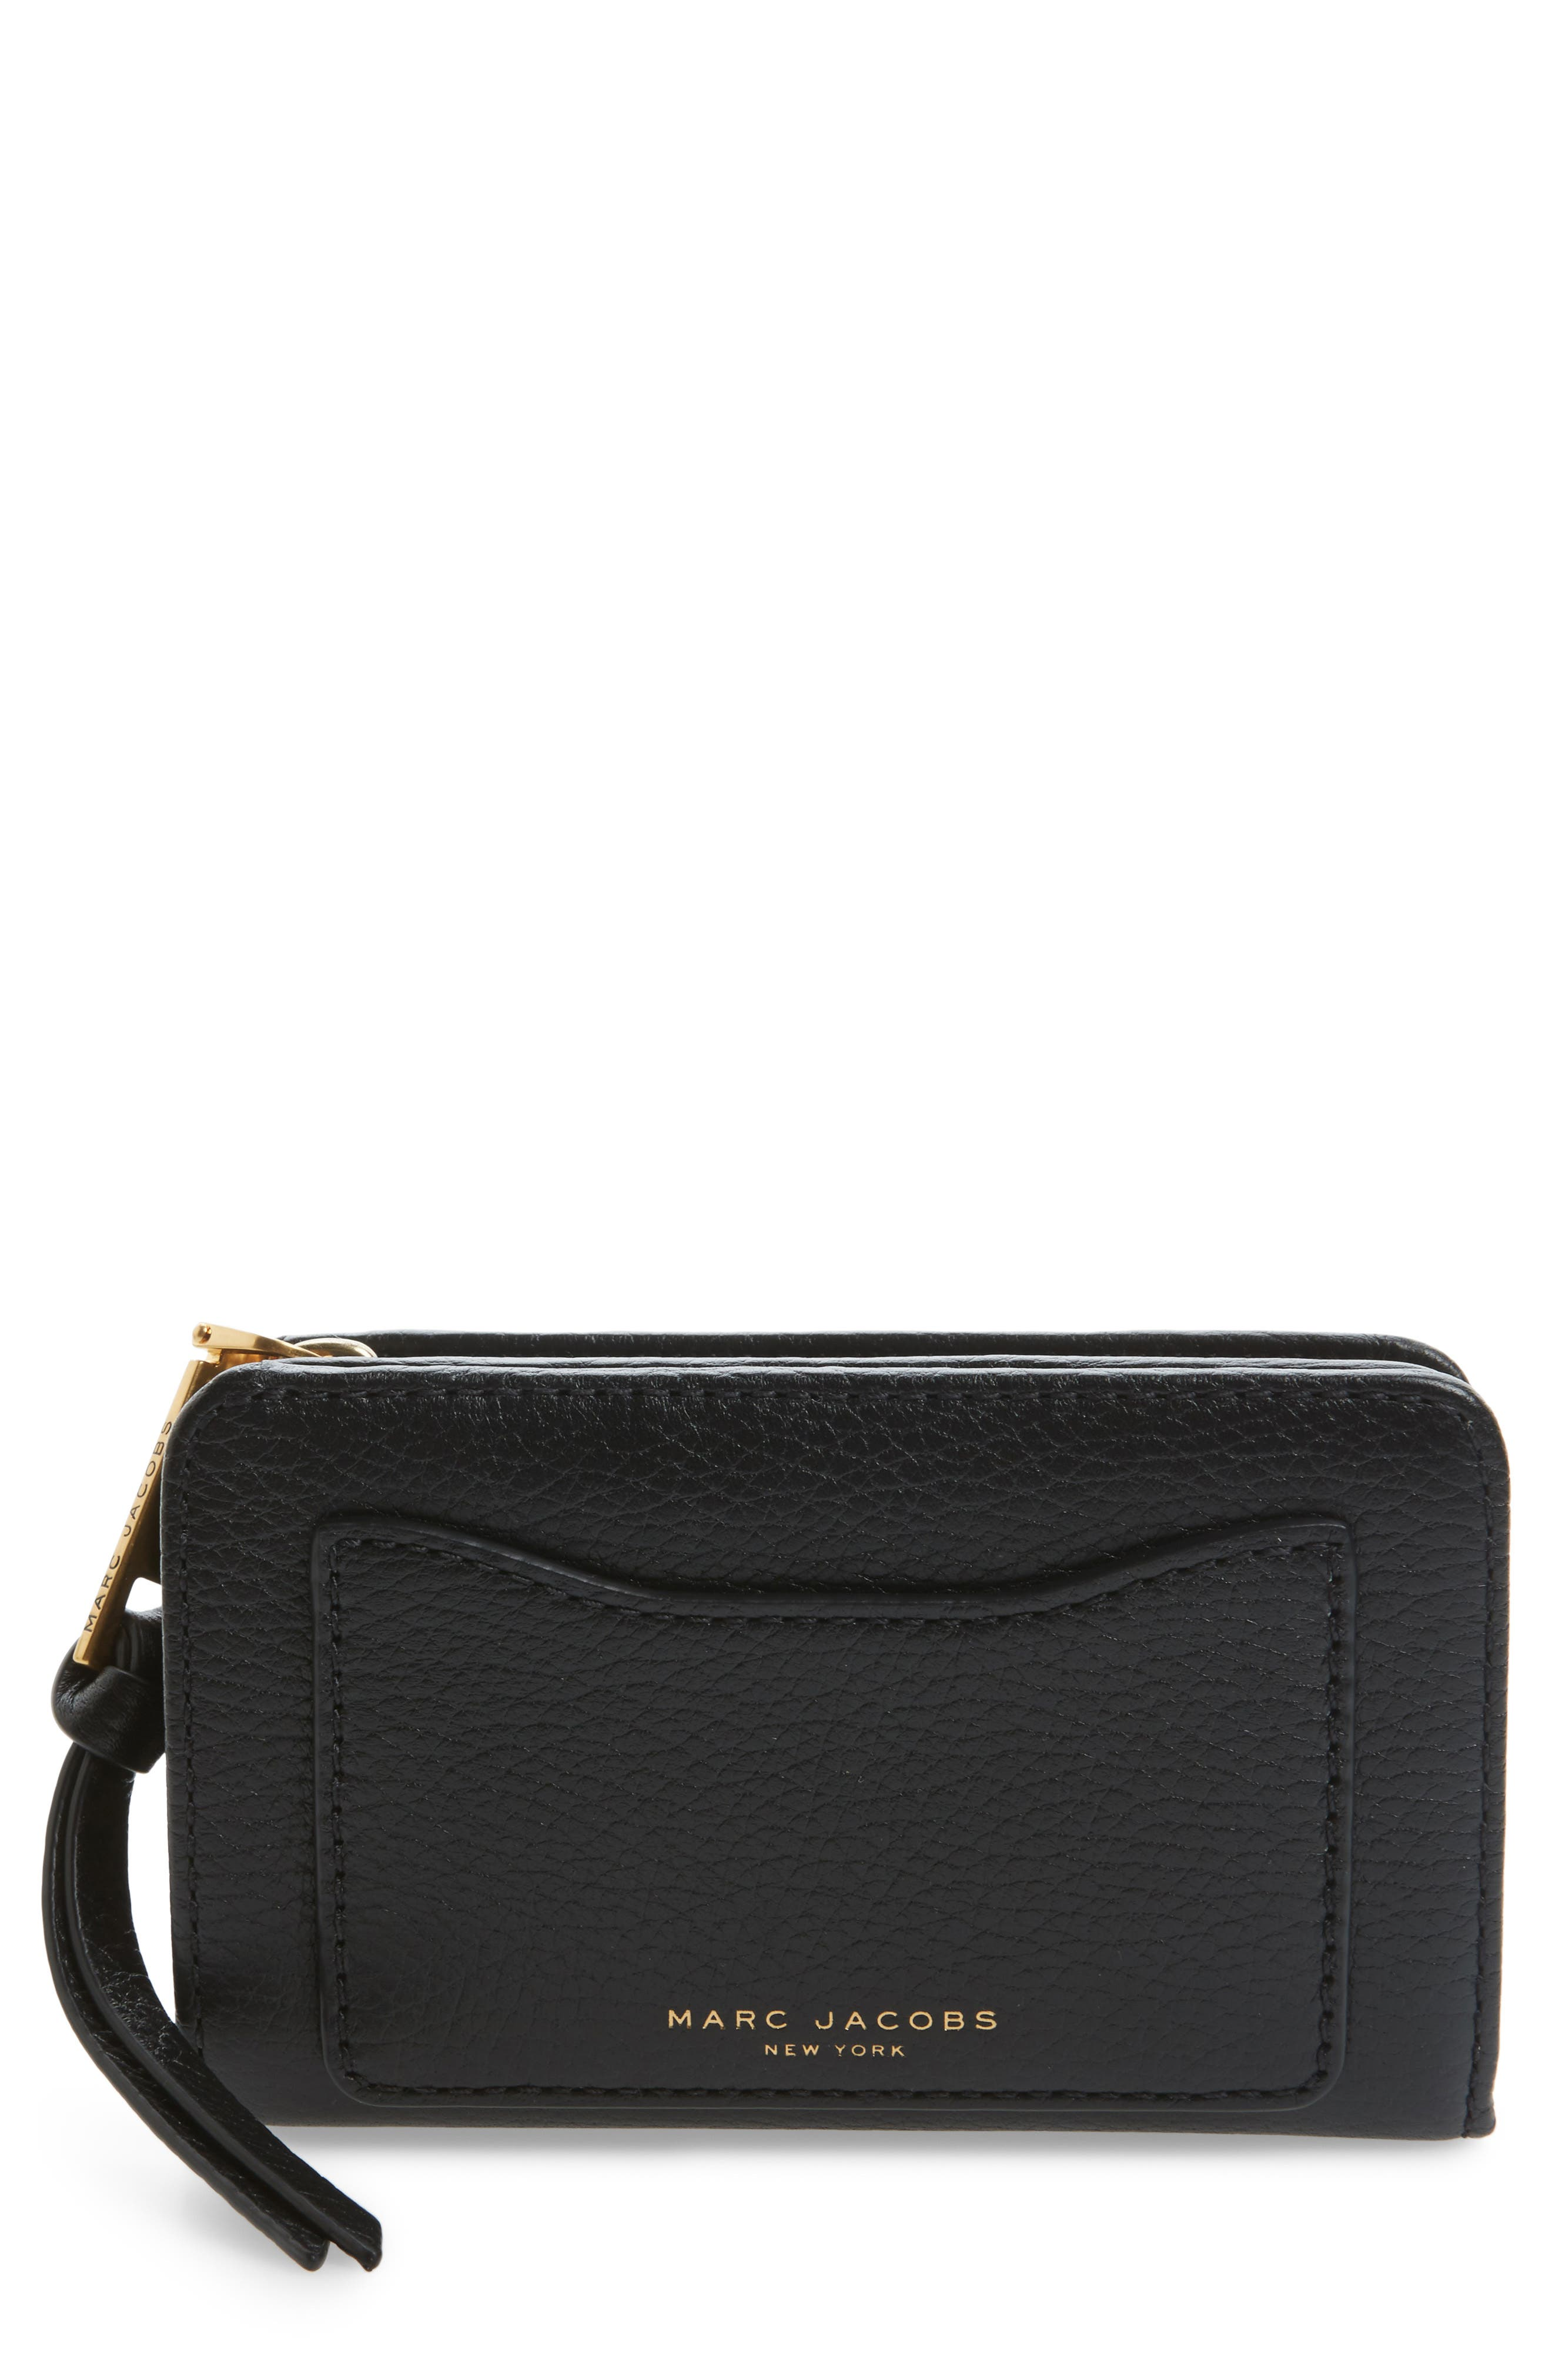 Recruit Compact Wallet,                             Main thumbnail 1, color,                             001